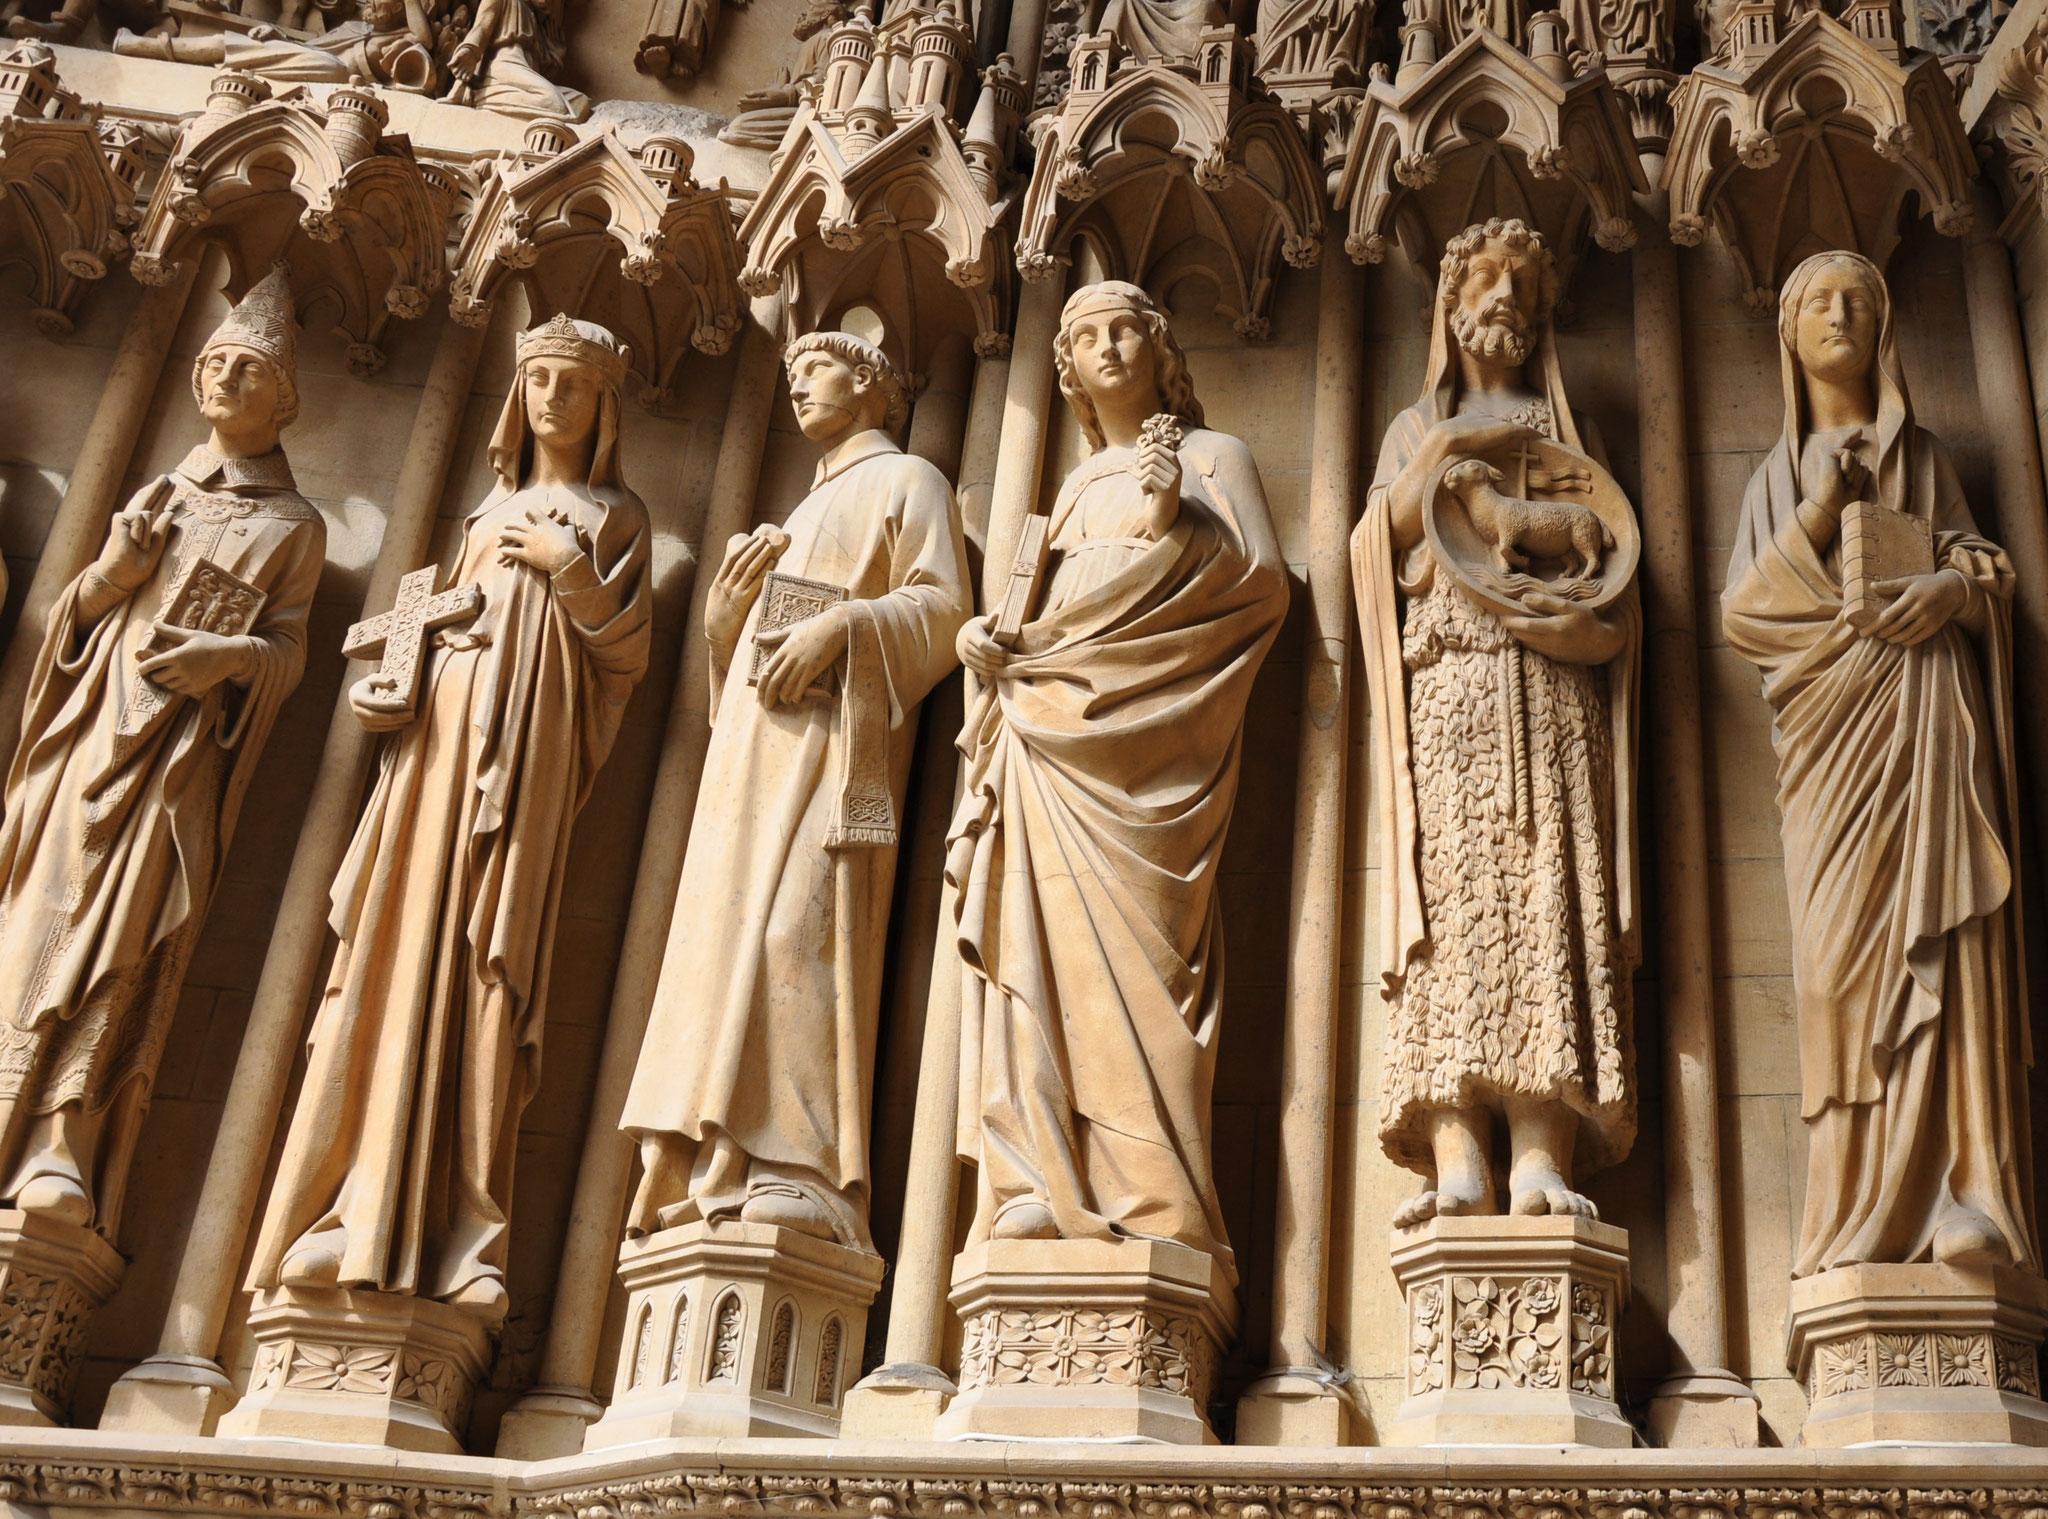 Portail de la cathédrale de Metz, Lorraine